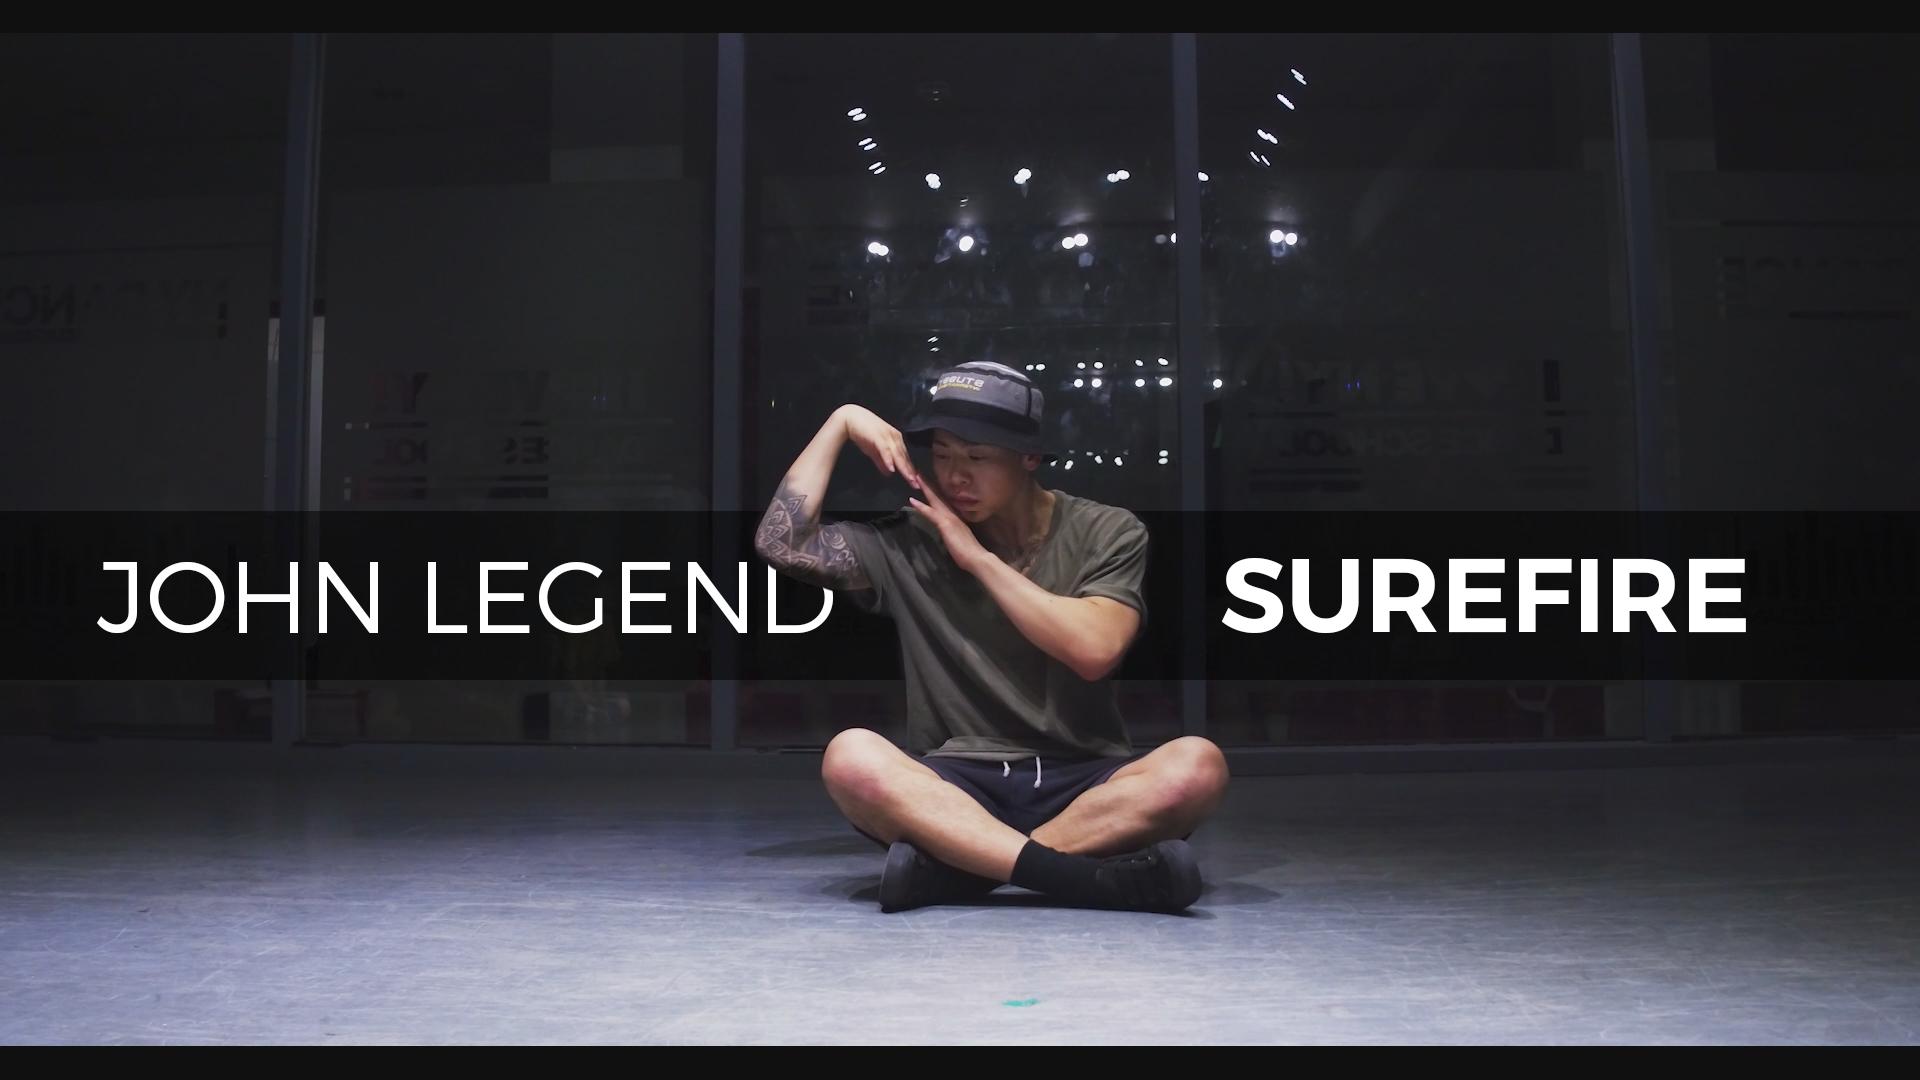 John Legend – Surefire (choreography_J-swag)